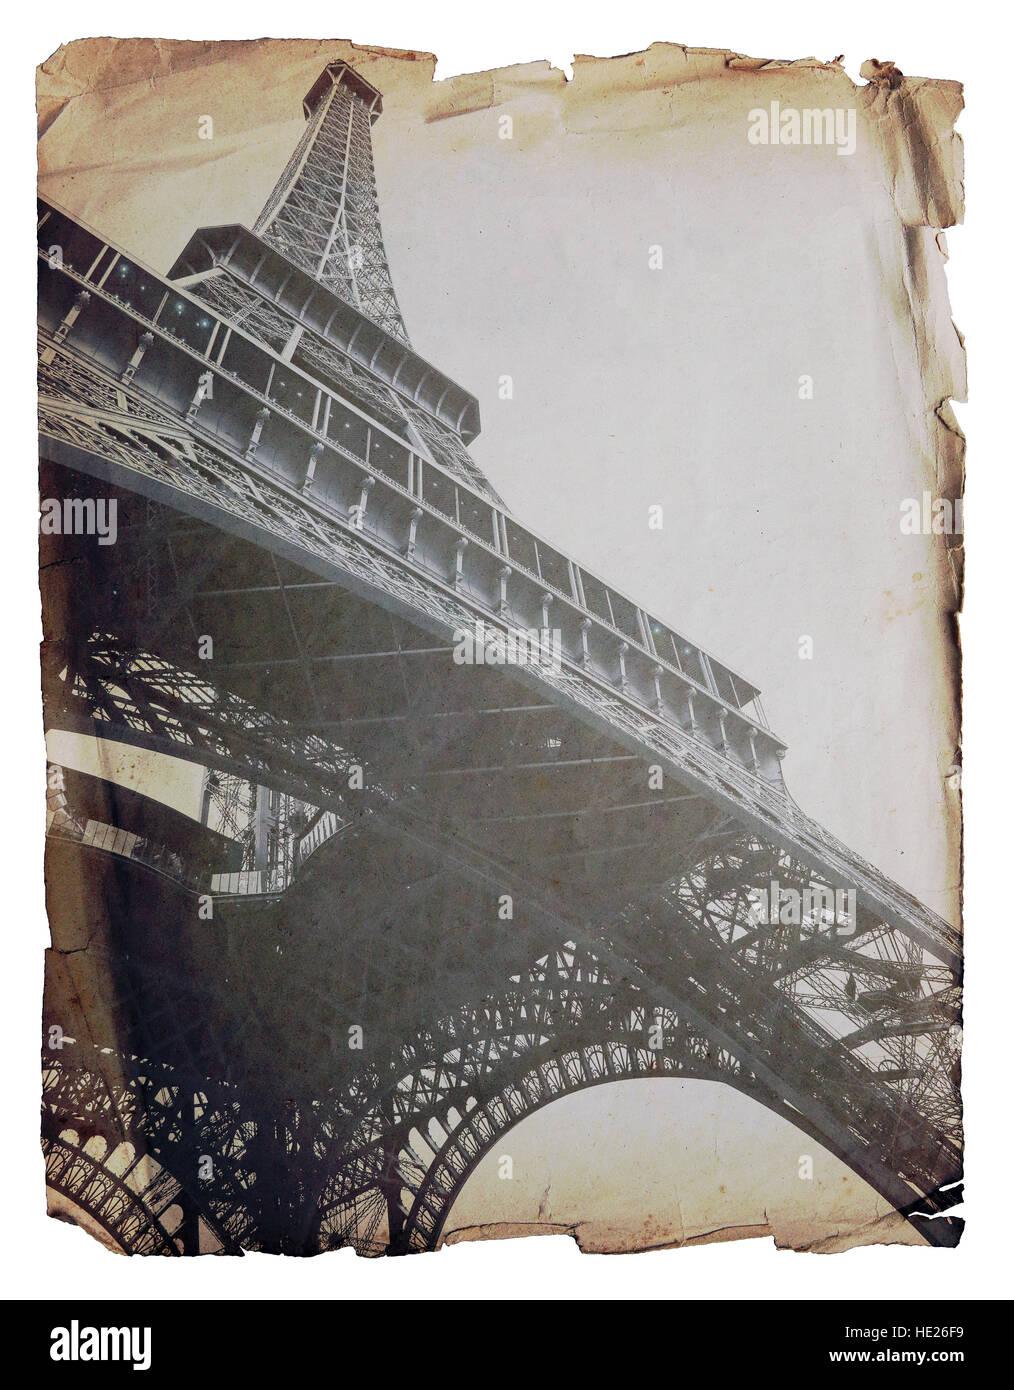 Eiffel Tower - retro postcard styled. - Stock Image